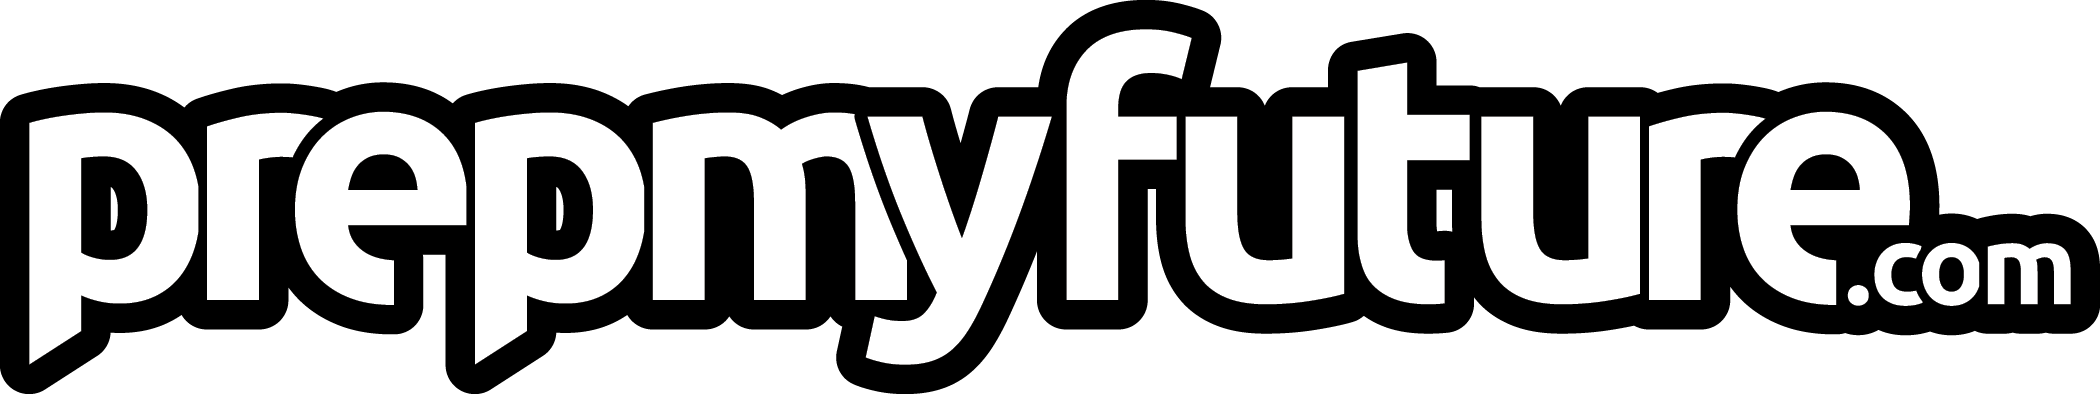 logo-prepmyfuture